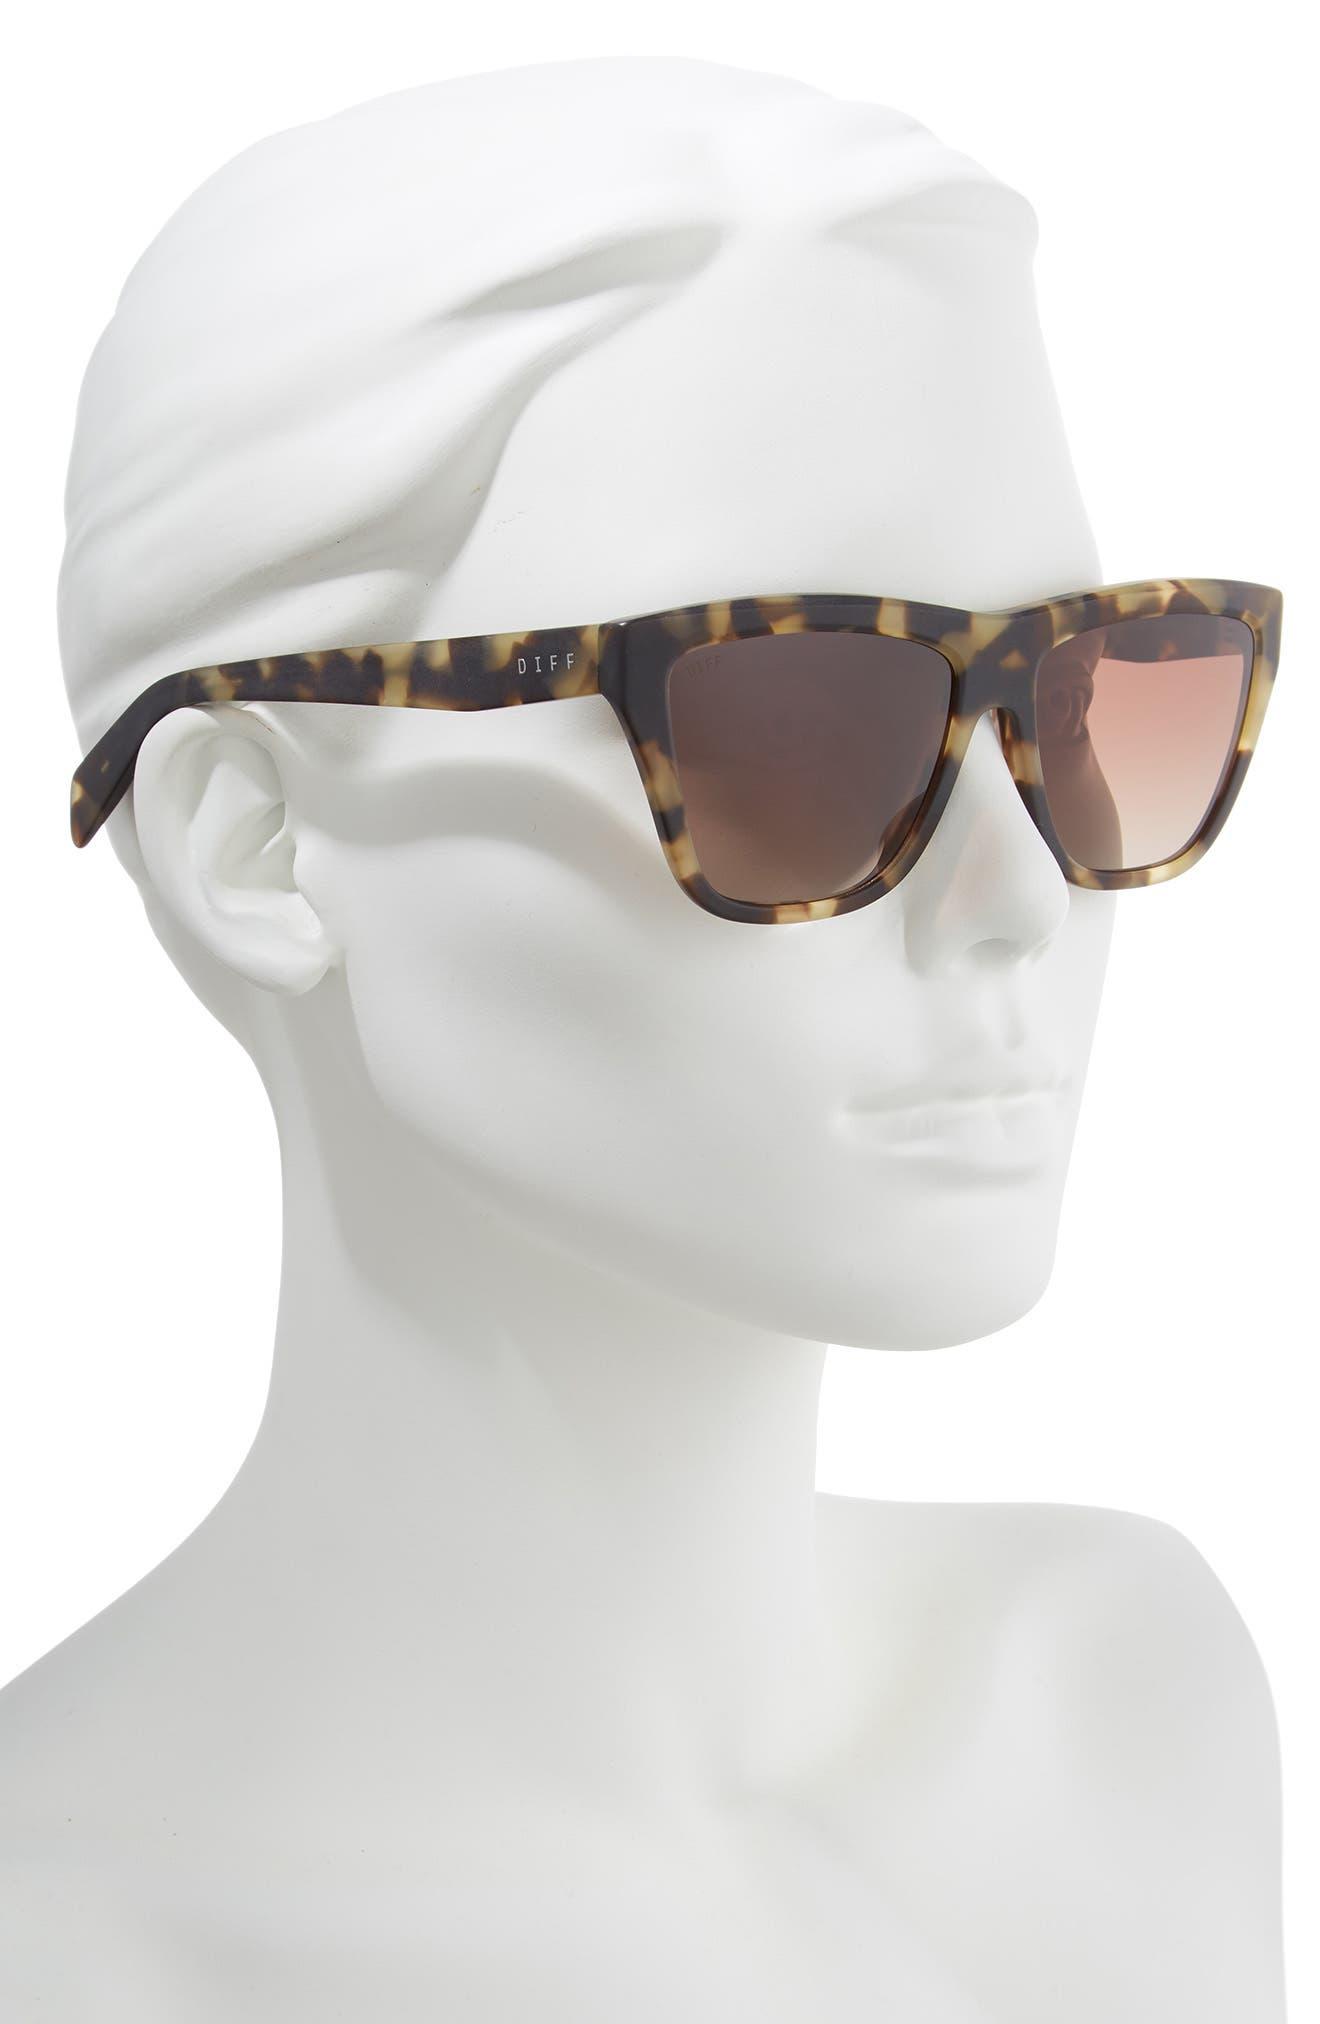 Harper 57mm Polarized Gradient Sunglasses,                             Alternate thumbnail 2, color,                             HAVANA/ BROWN